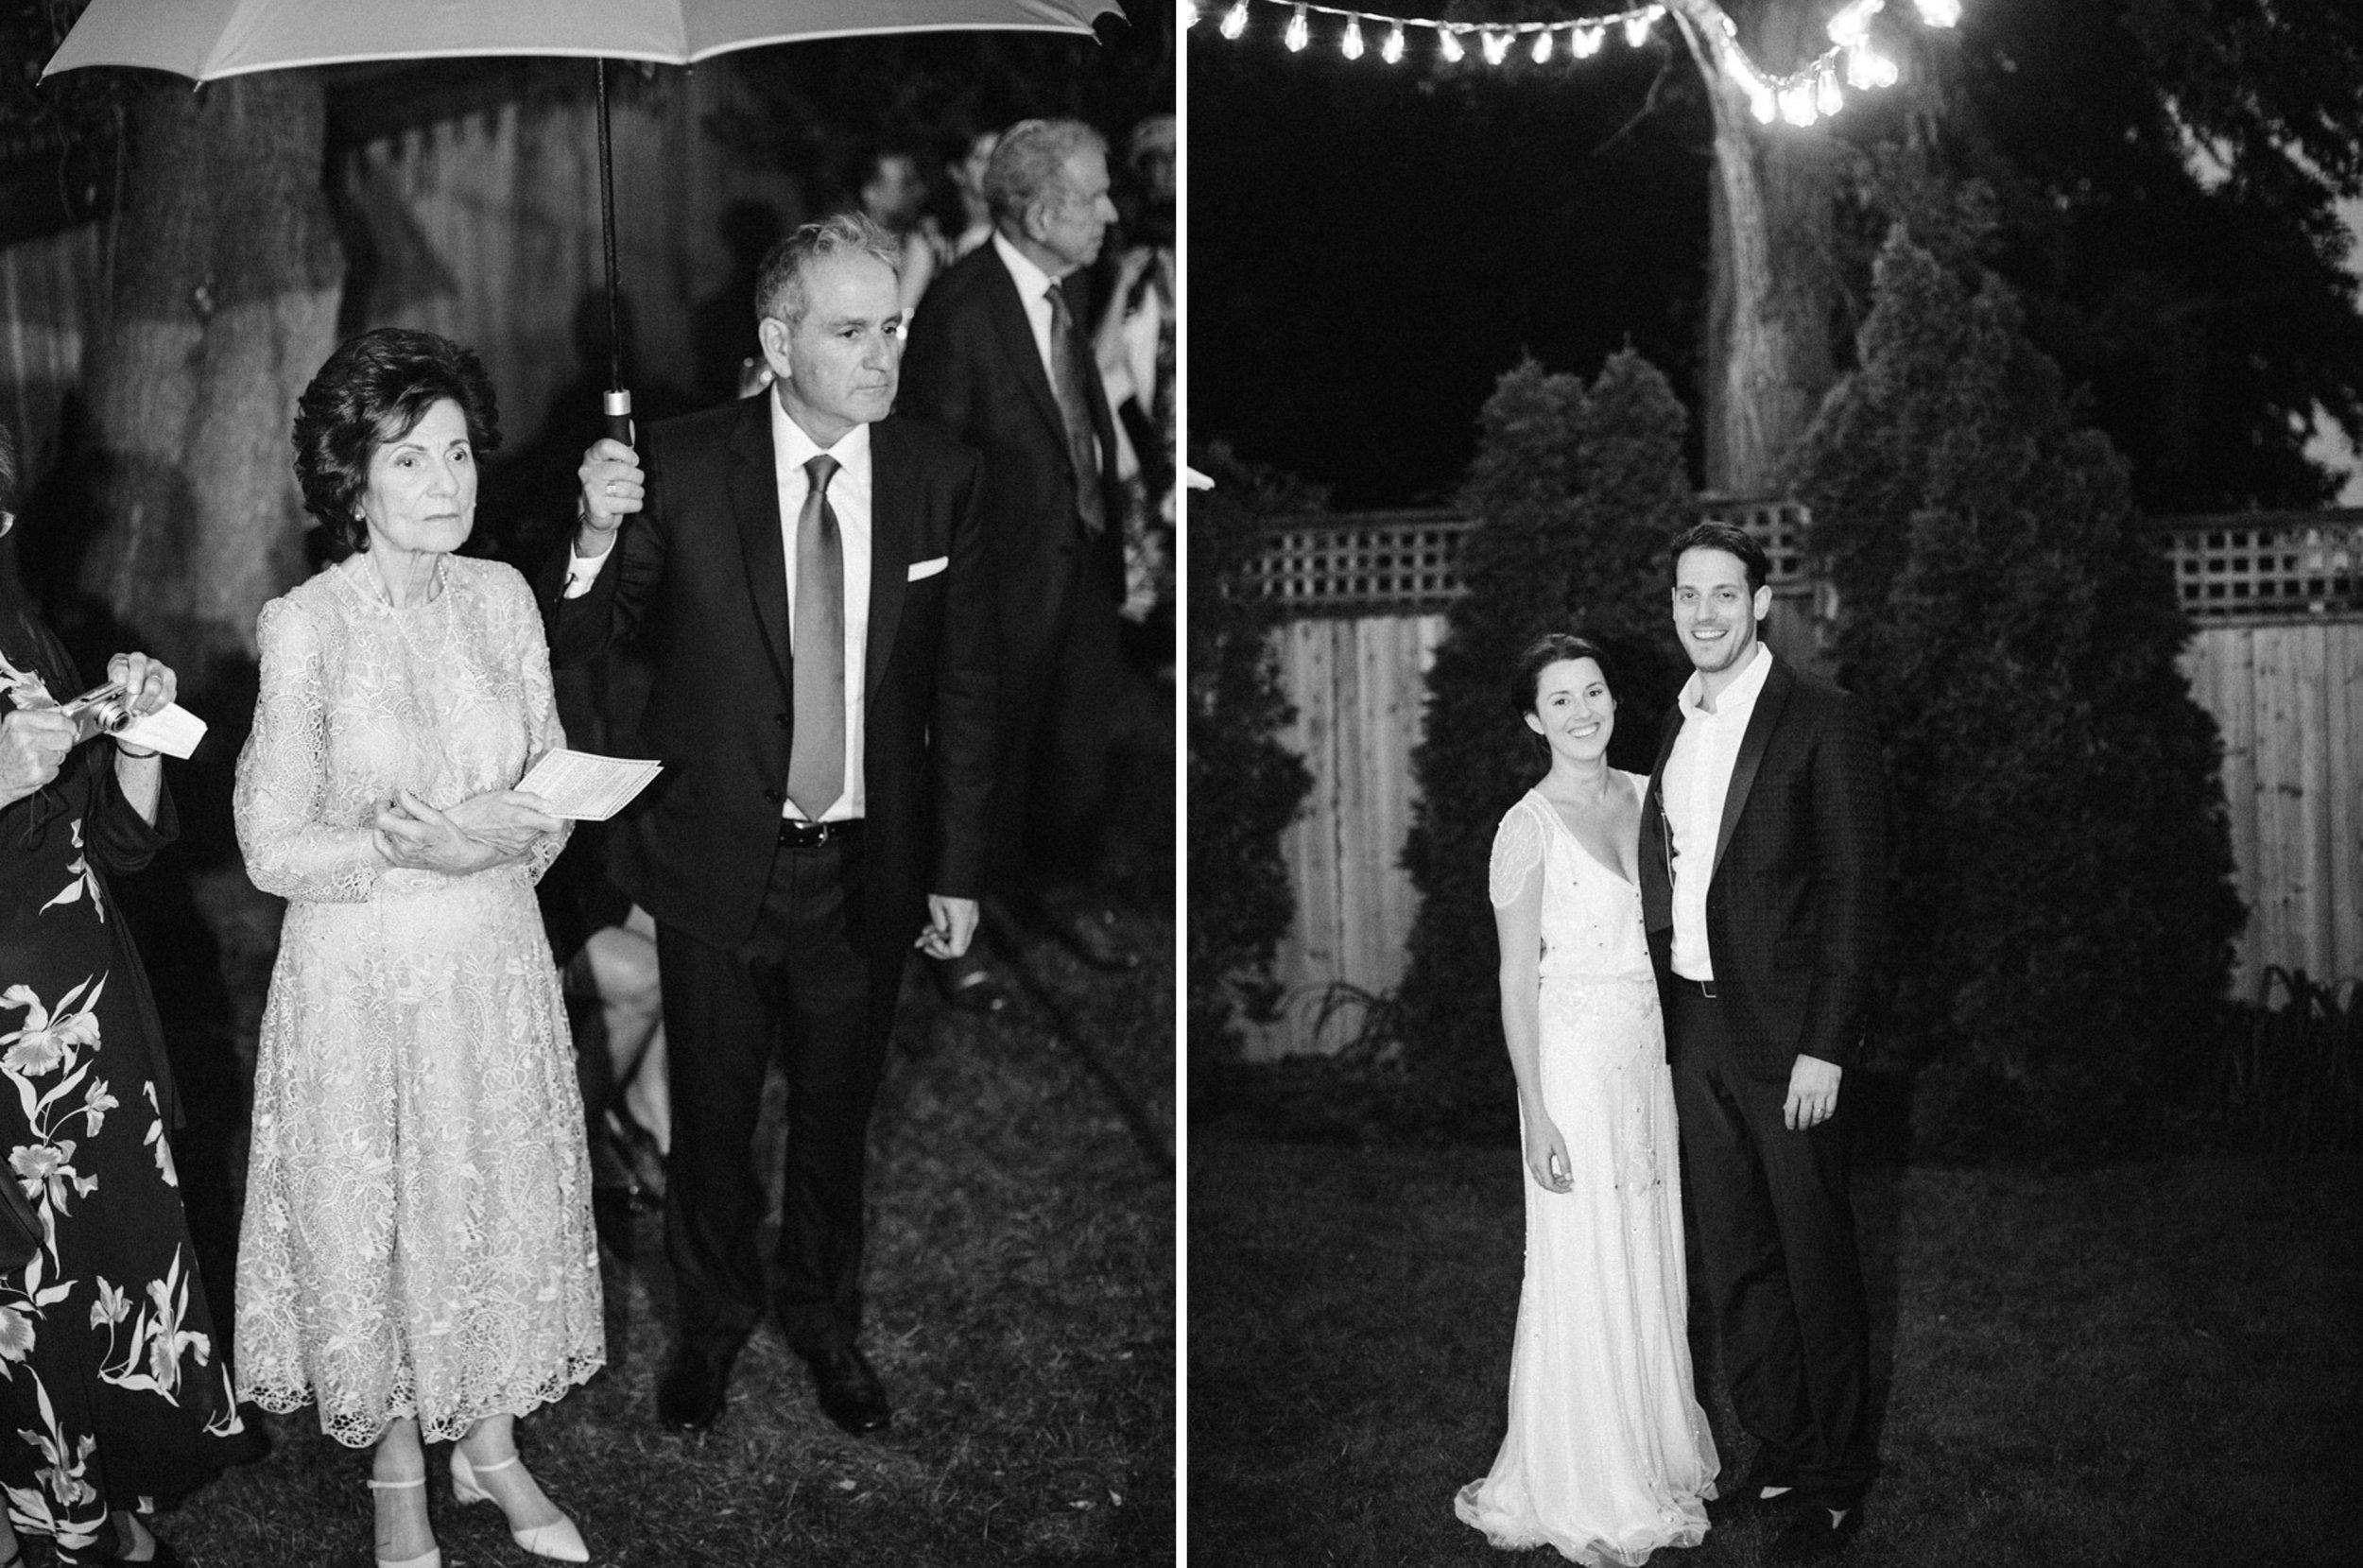 toronto_wedding_photographer_the_great_hall20.jpg